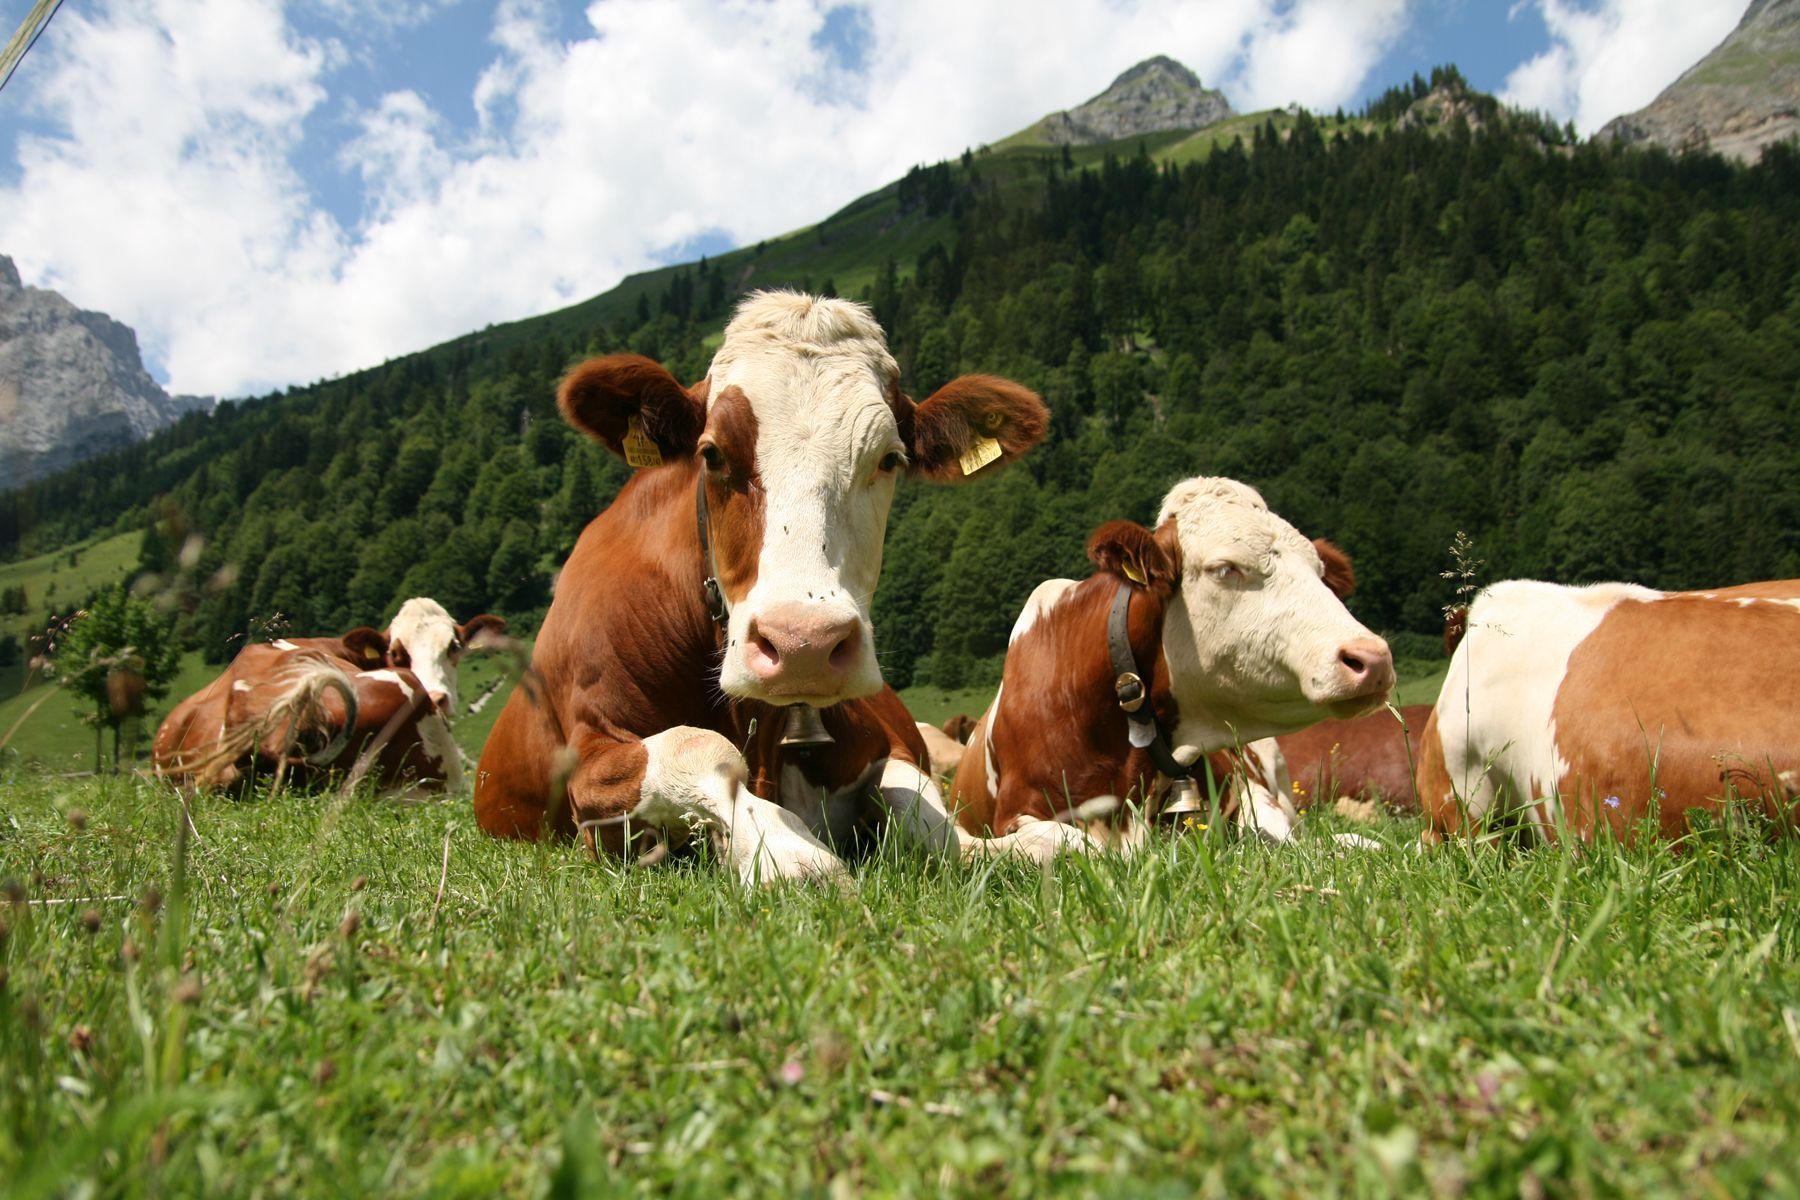 Farm Landscapes Landscapes Nature Cow Cows Animal Farm Animals Zoo Funny Hd Wallpaper Cute Cows Farm Animals Animals